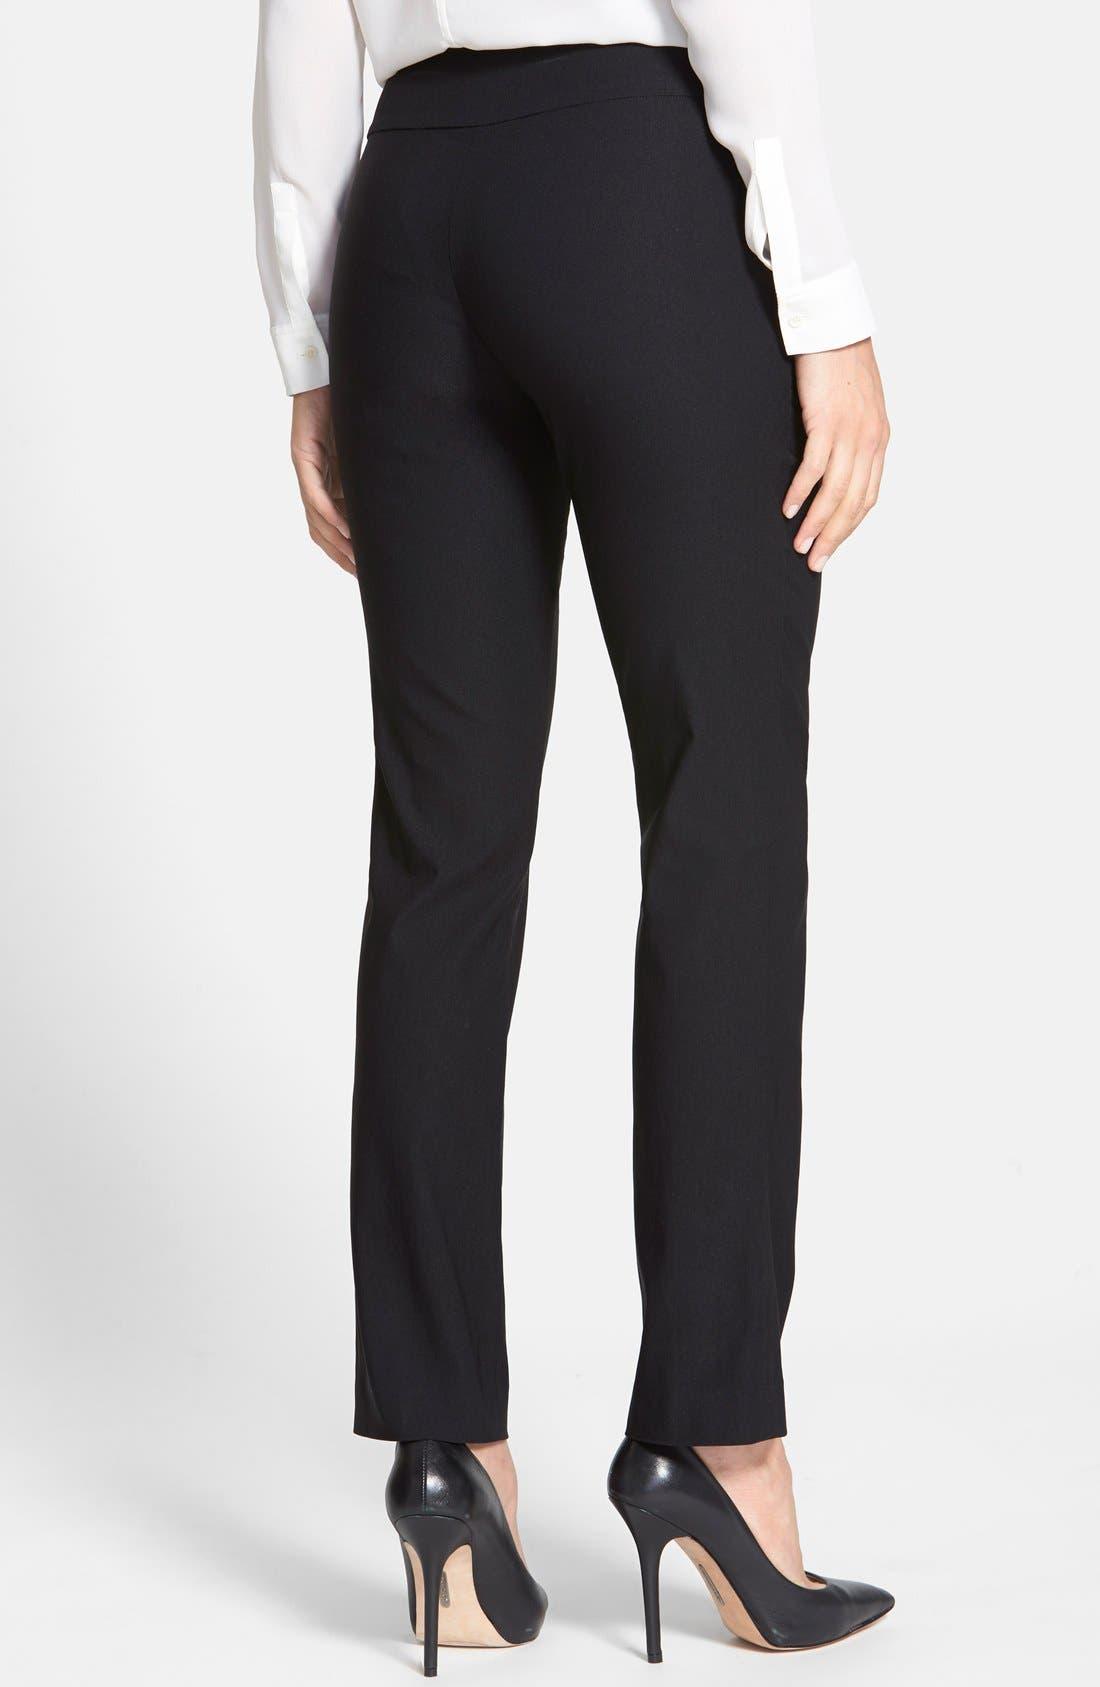 Wonderstretch Straight Leg Pants,                             Alternate thumbnail 8, color,                             BLACK ONYX